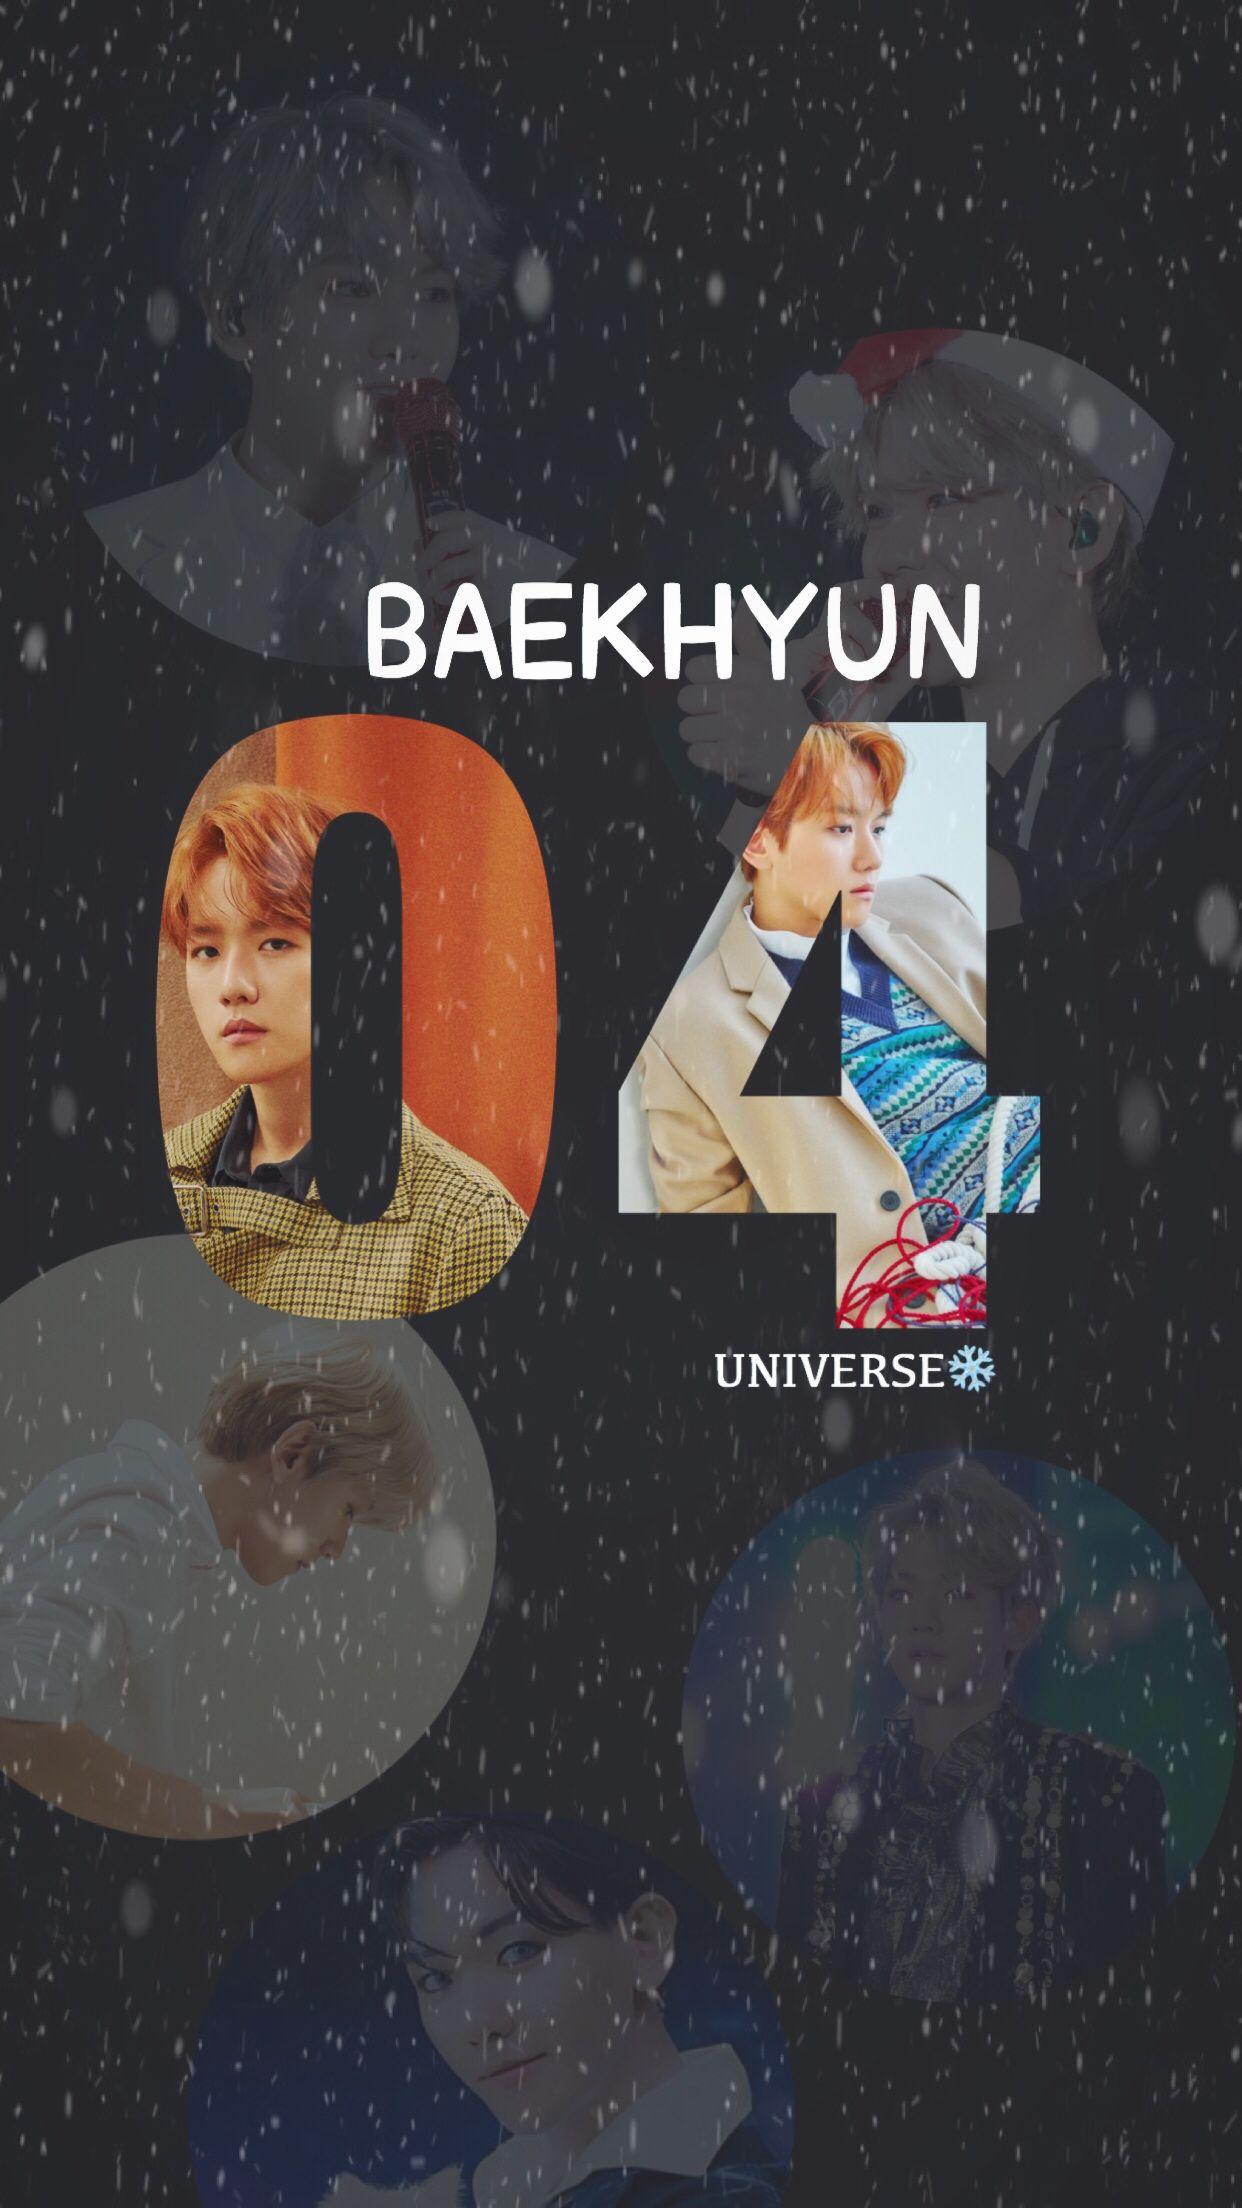 Baekhyun - Exo Baekhyun Wallpaper Universe , HD Wallpaper & Backgrounds